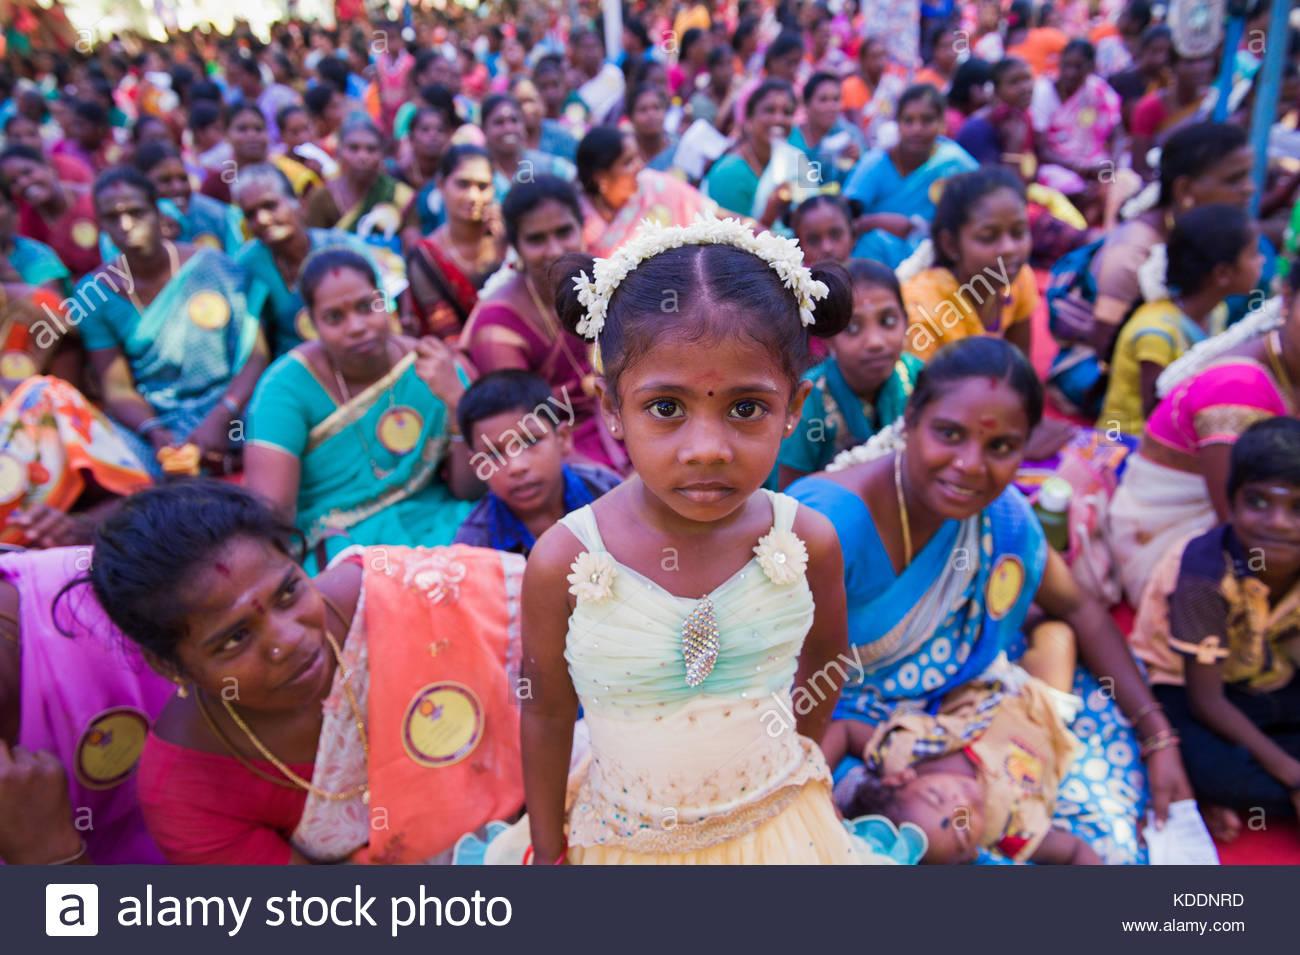 Indian Caste Stock Photos & Indian Caste Stock Images